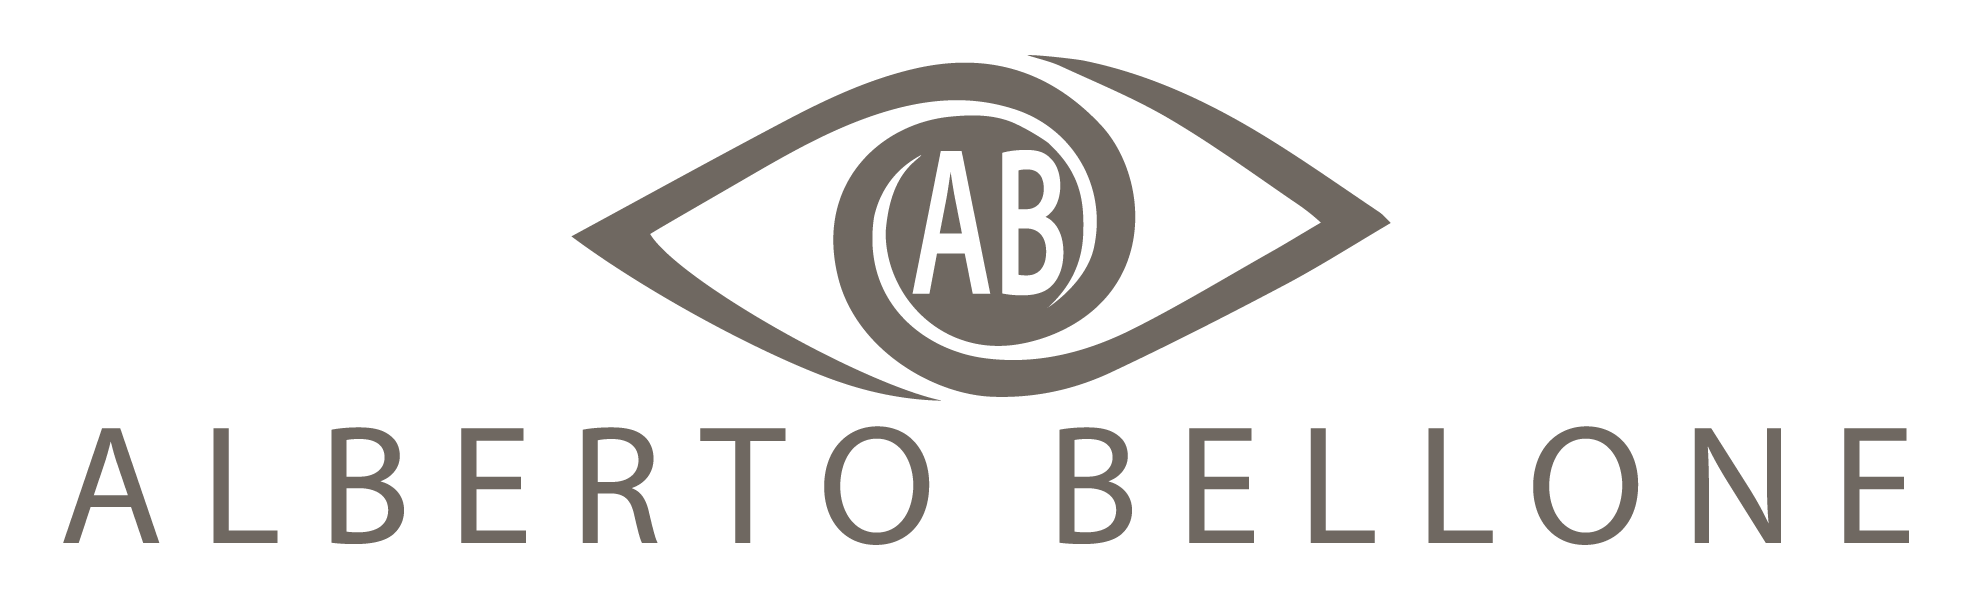 alberto bellone milano logo